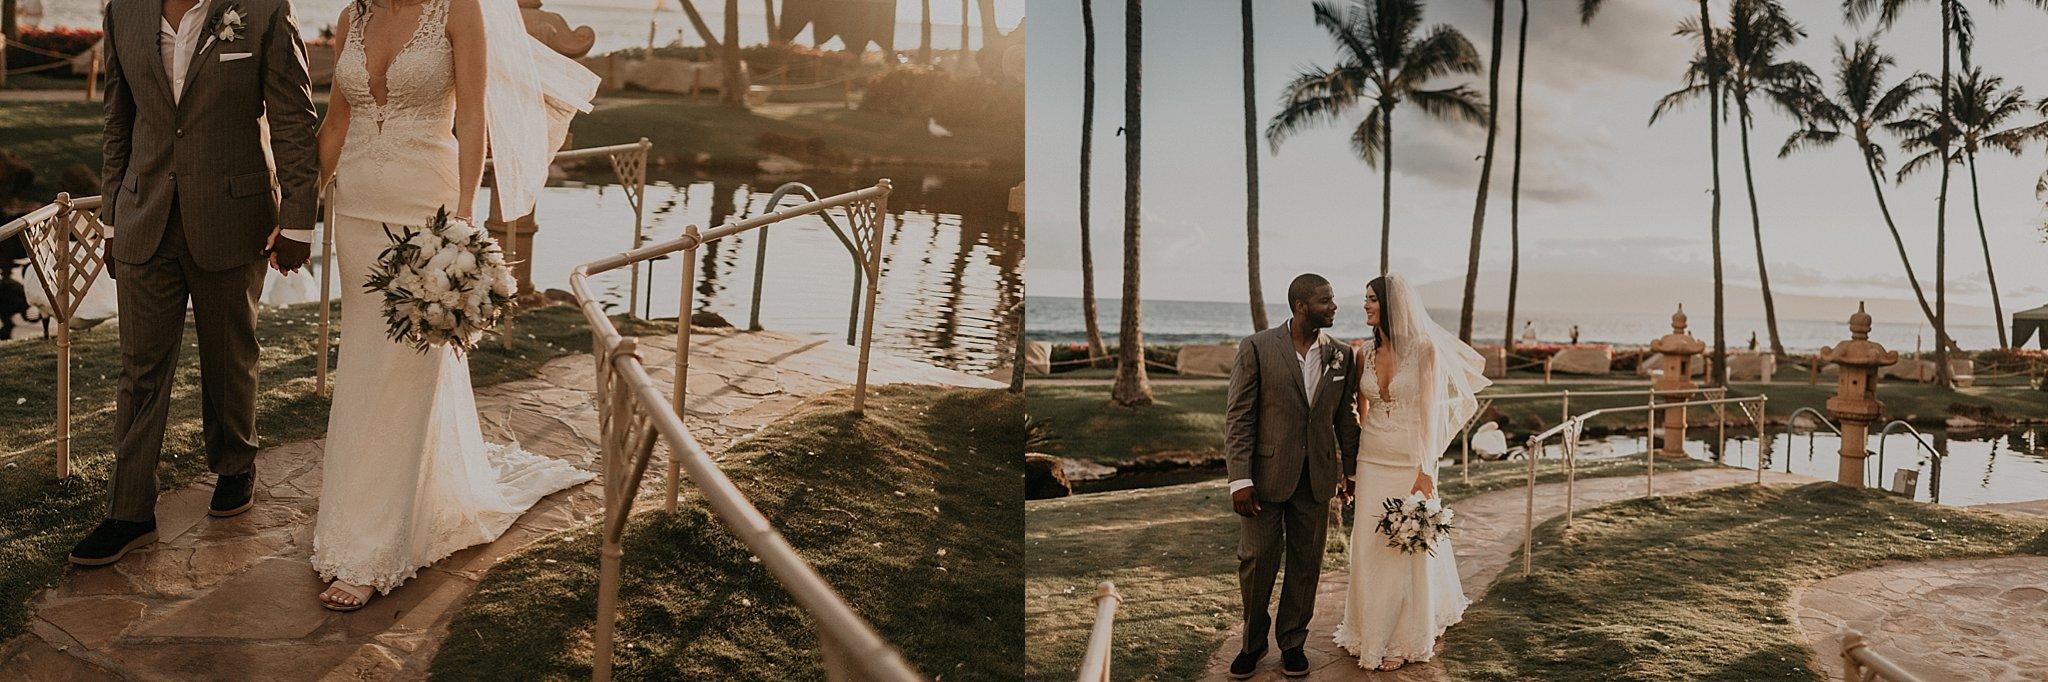 samantha_mcfarlen_bellingham_washington_engagement_photography_seattle_wedding_photographer_0231.jpg